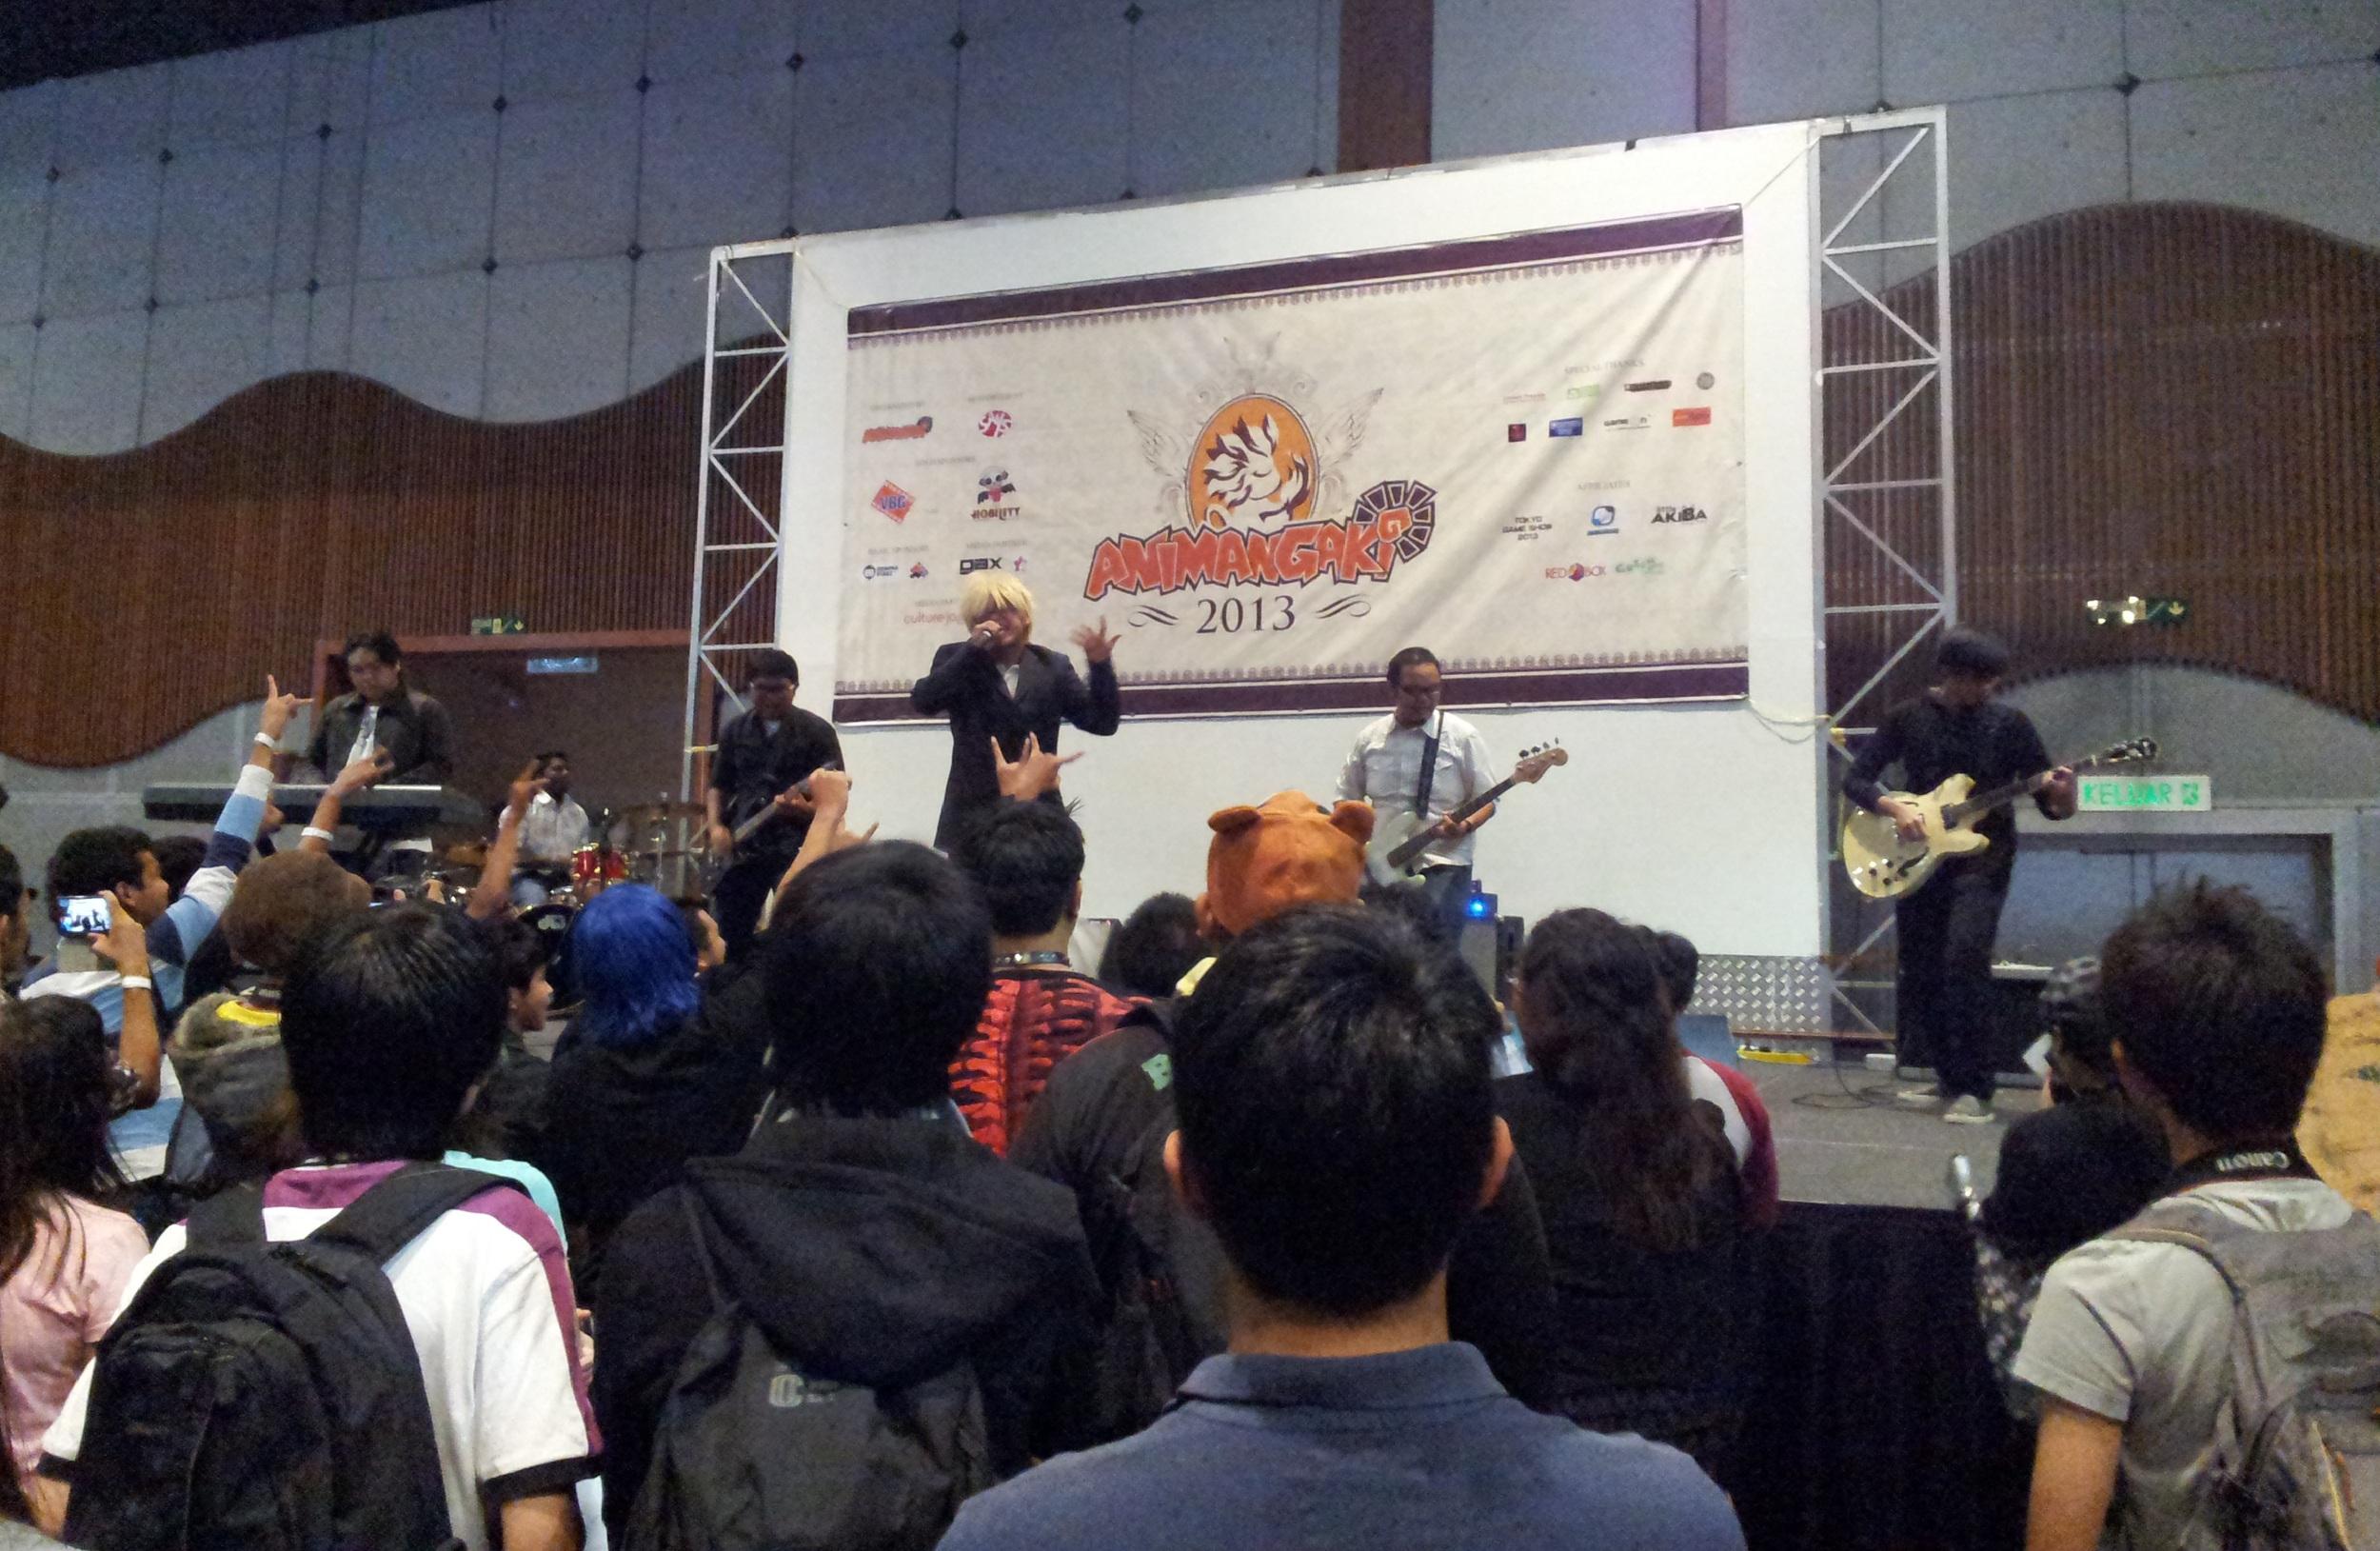 Photo showing a band performing in Animangaki at Kuala Lumpur.